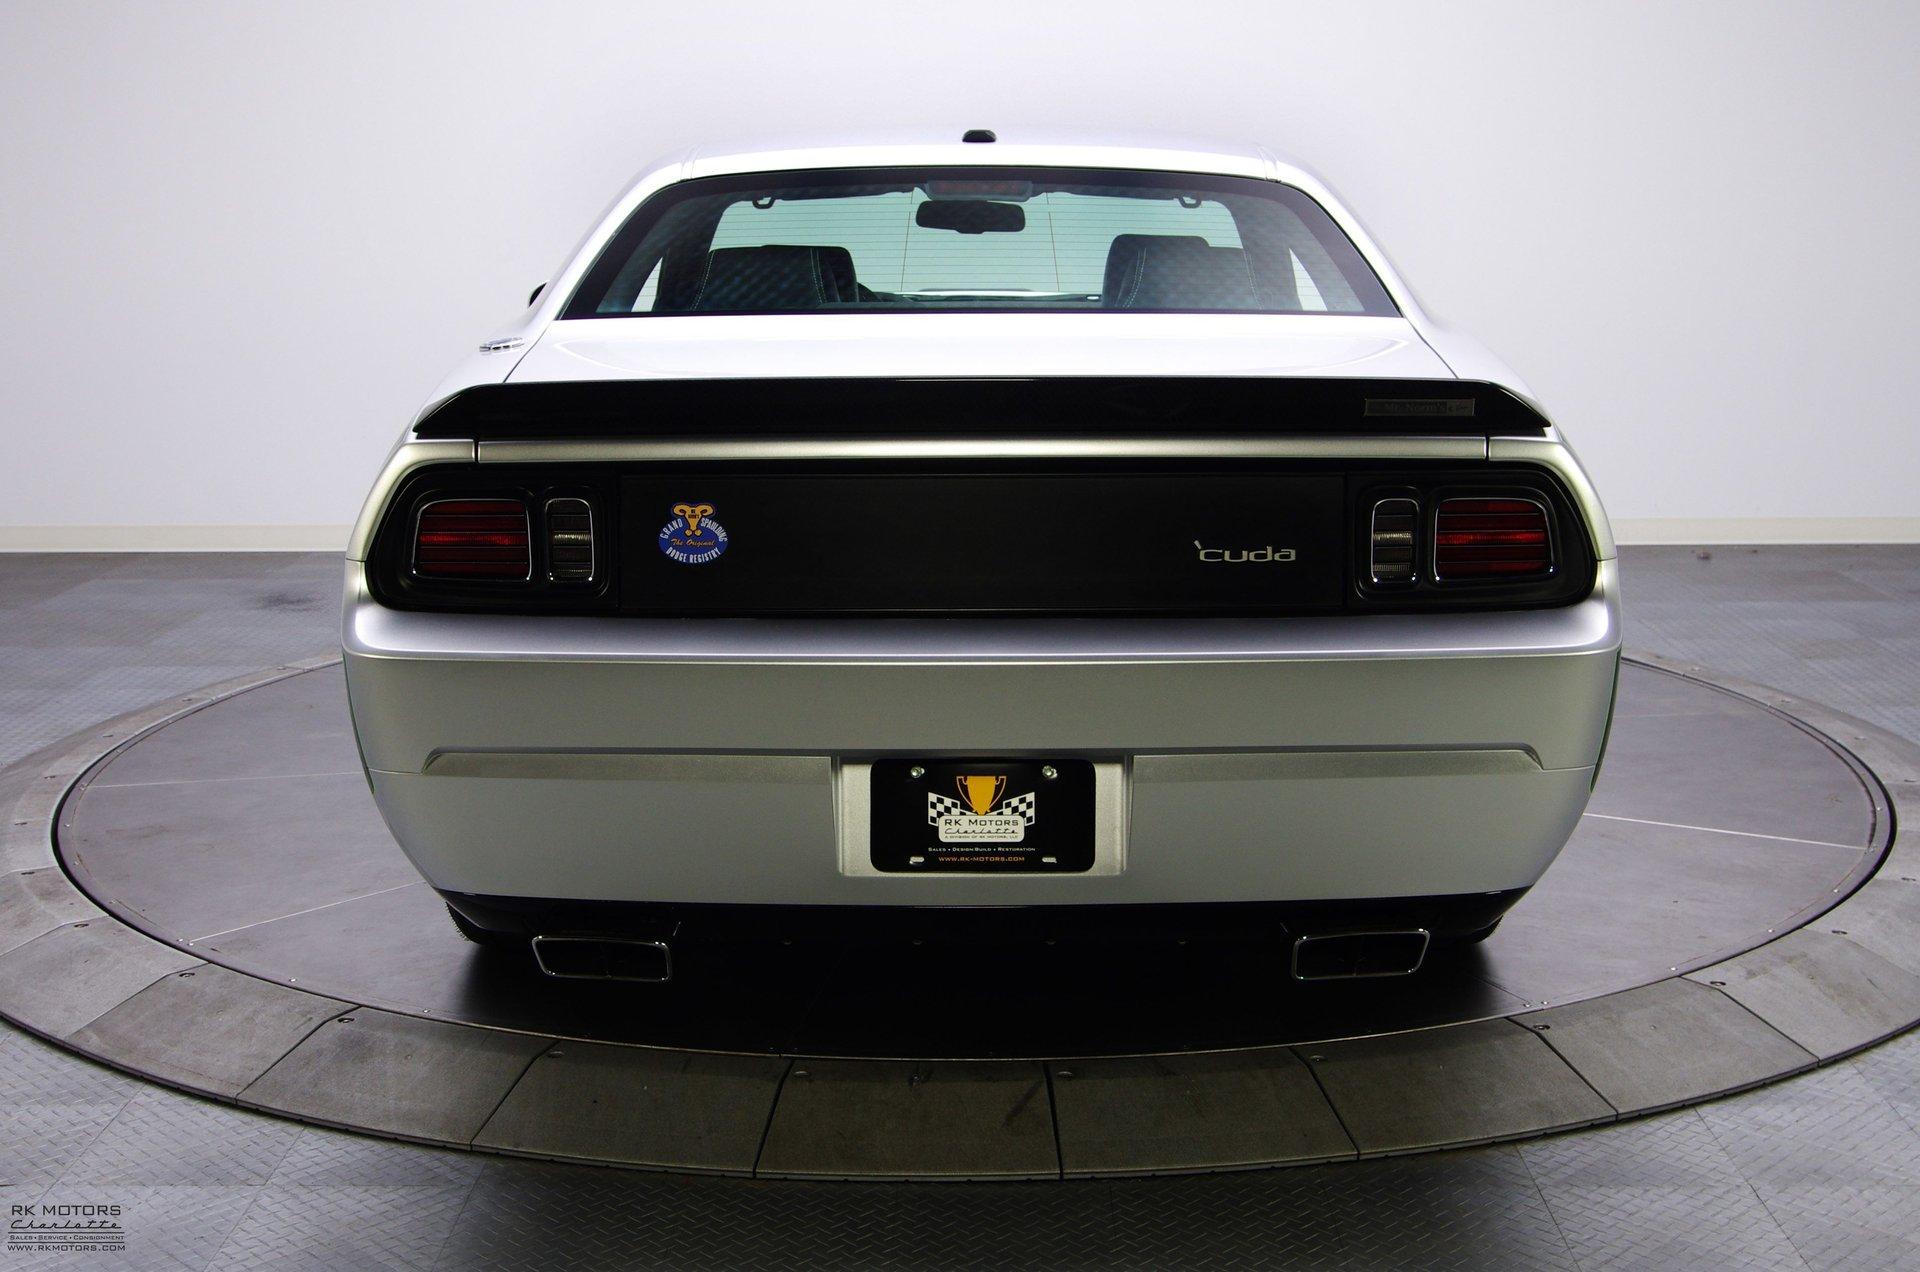 132524 2009 Dodge Challenger RK Motors Classic Cars for Sale